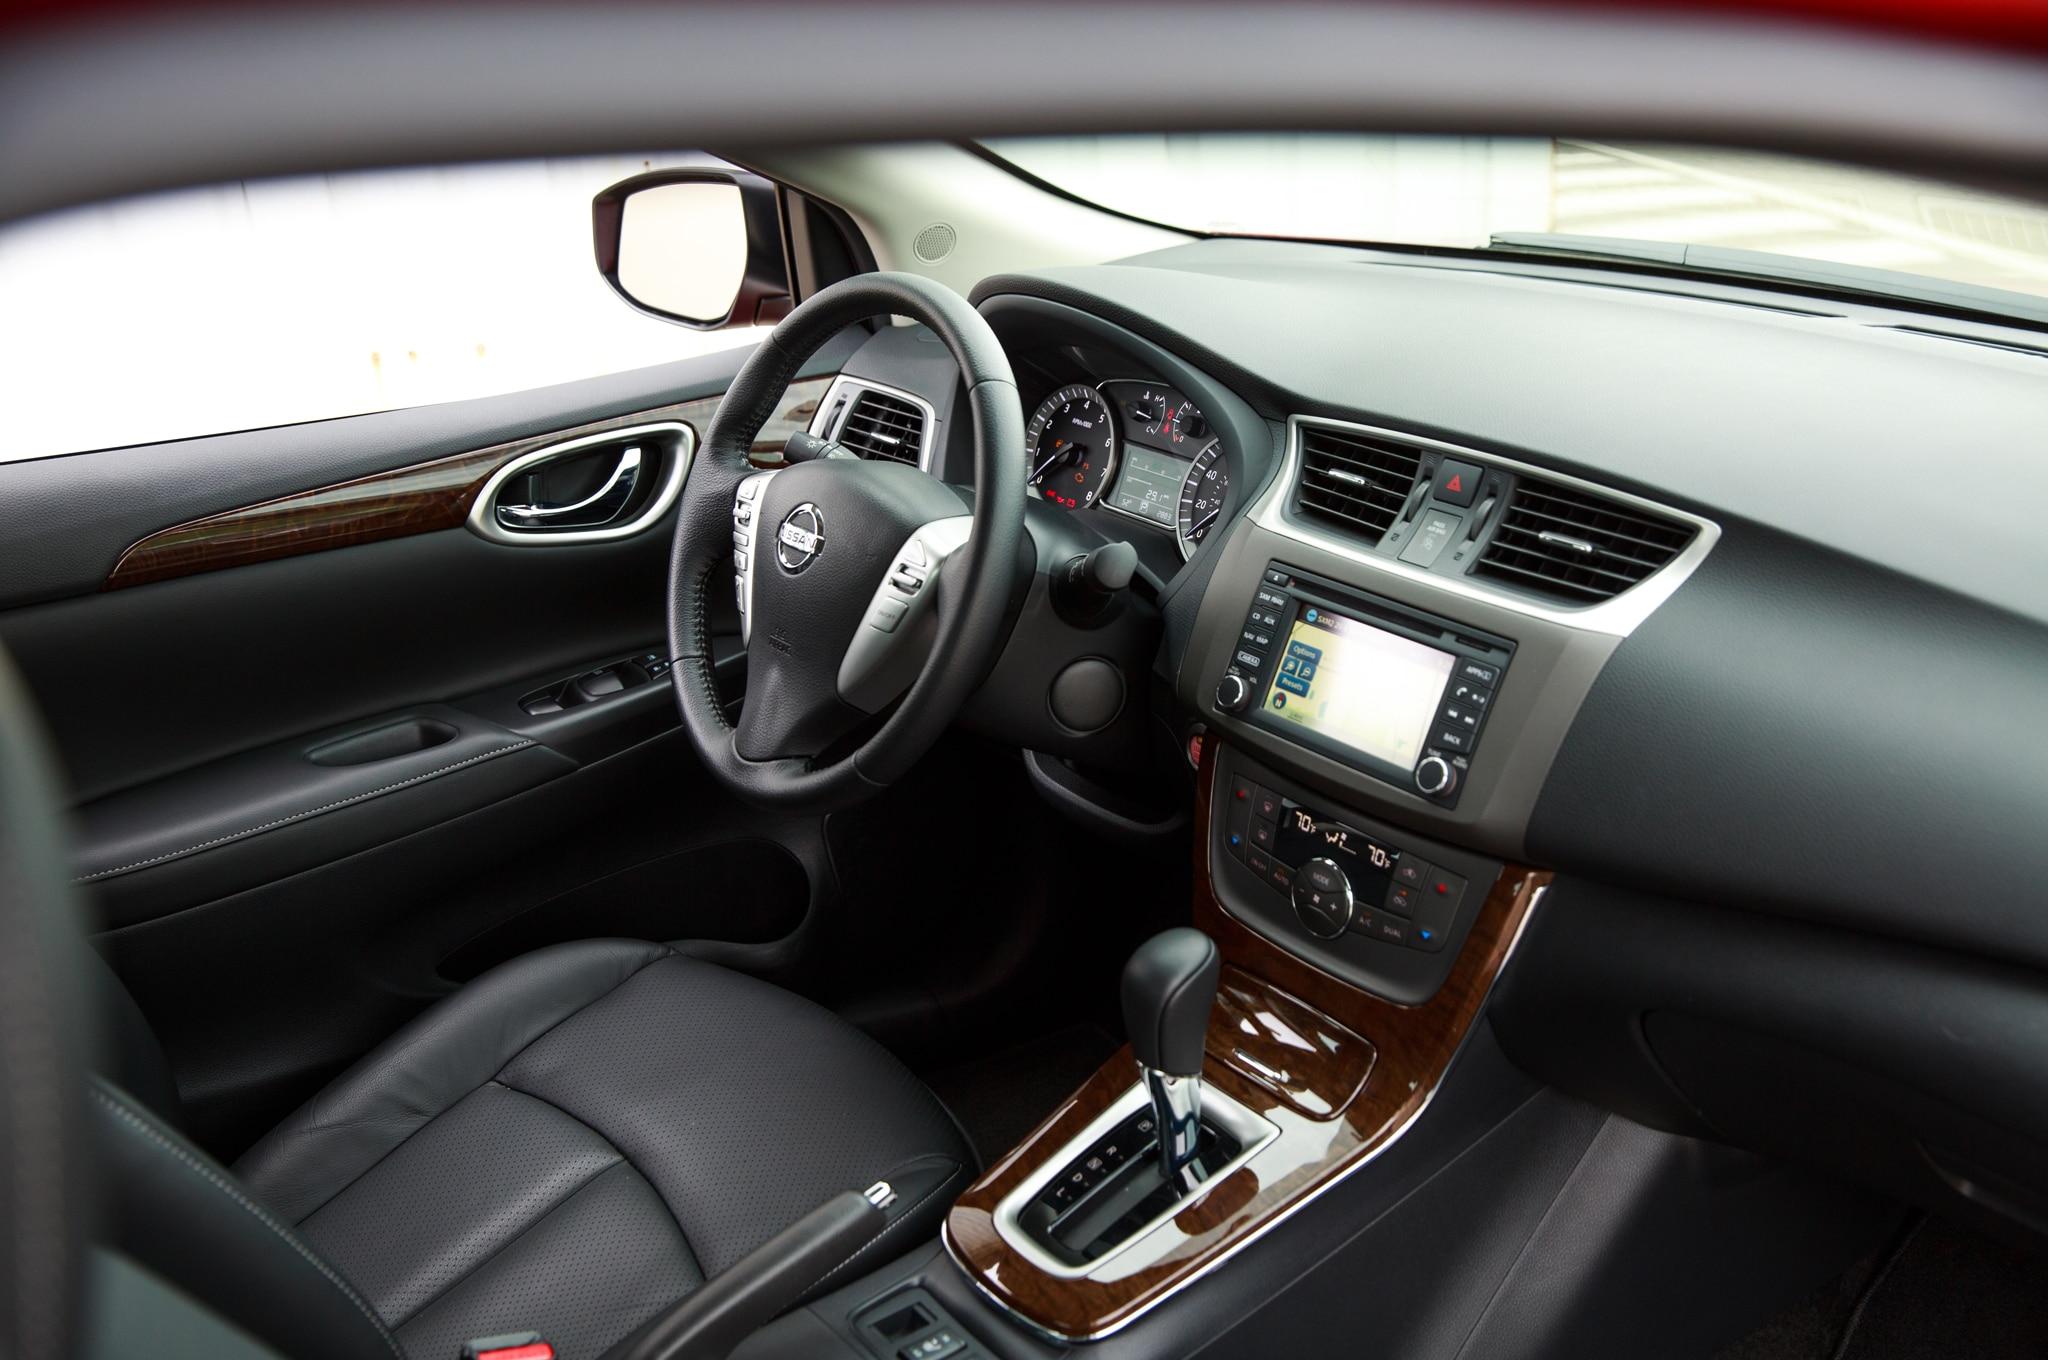 2014 Nissan Sentra: Around the Block